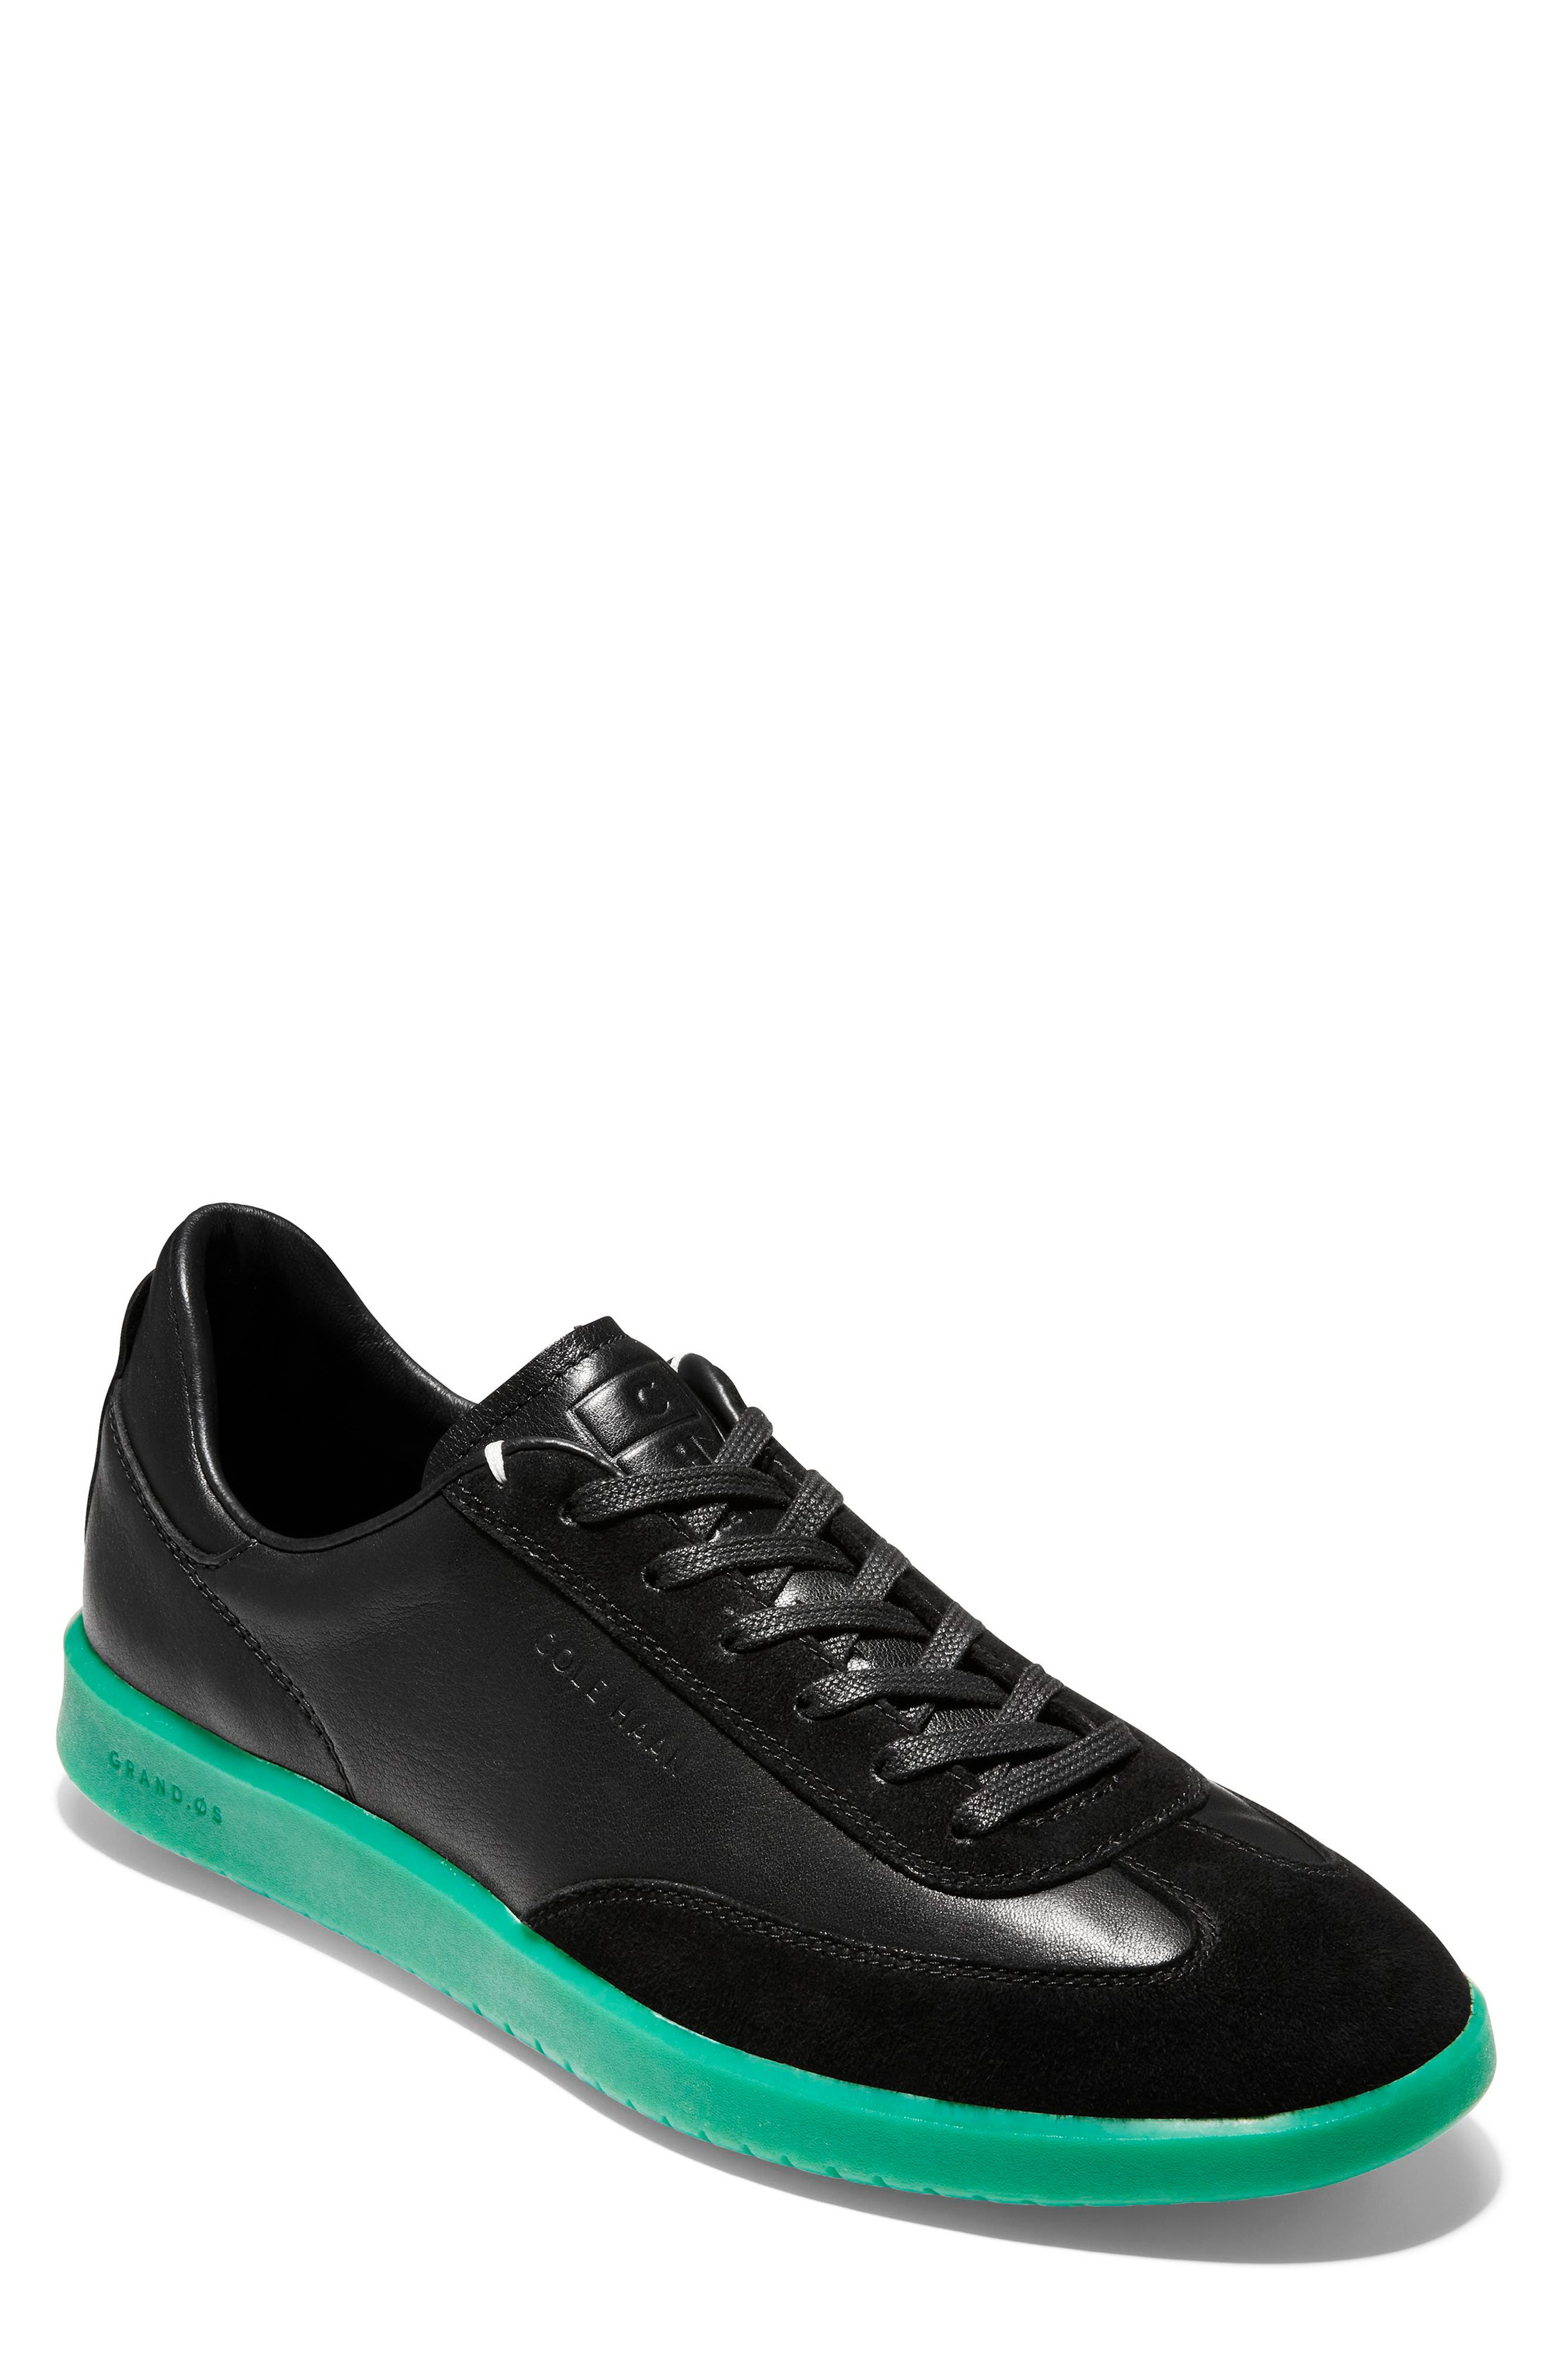 COLE HAAN GrandPro Turf Sneaker, Main, color, BLACK/ GREEN TRANSLUCENT